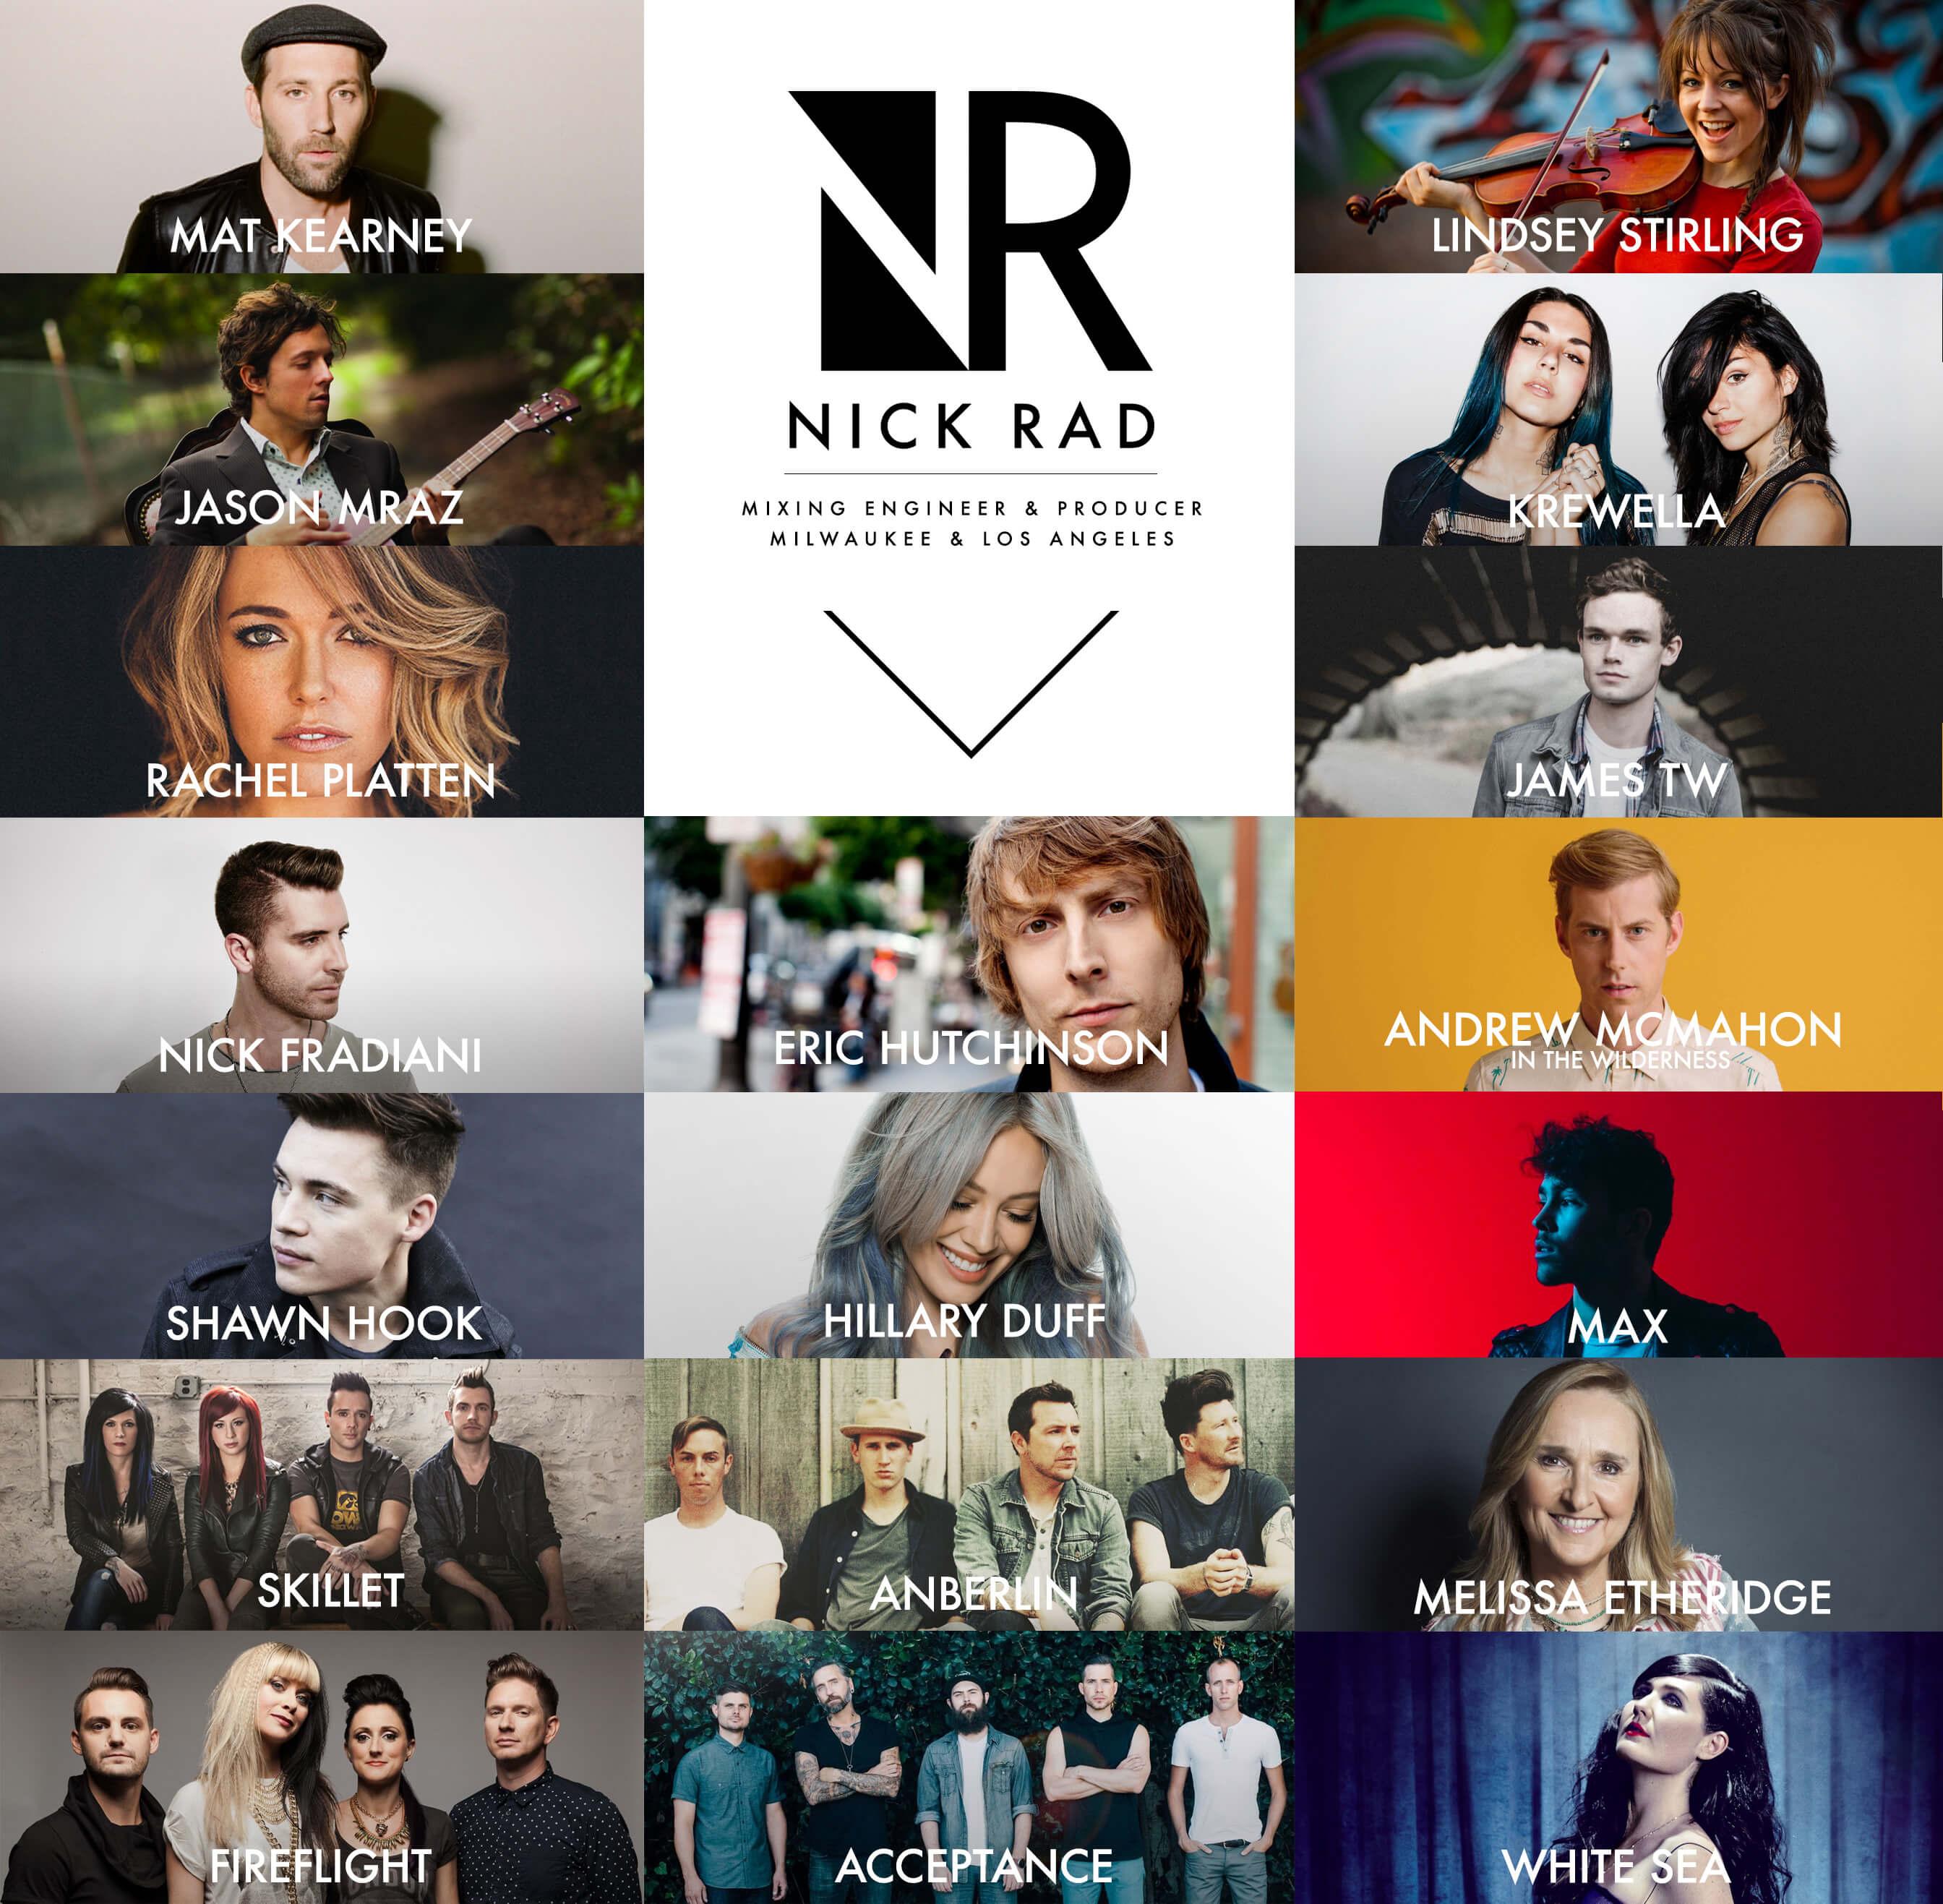 Nick Rad - LA Based Mixing Engineer and Producer